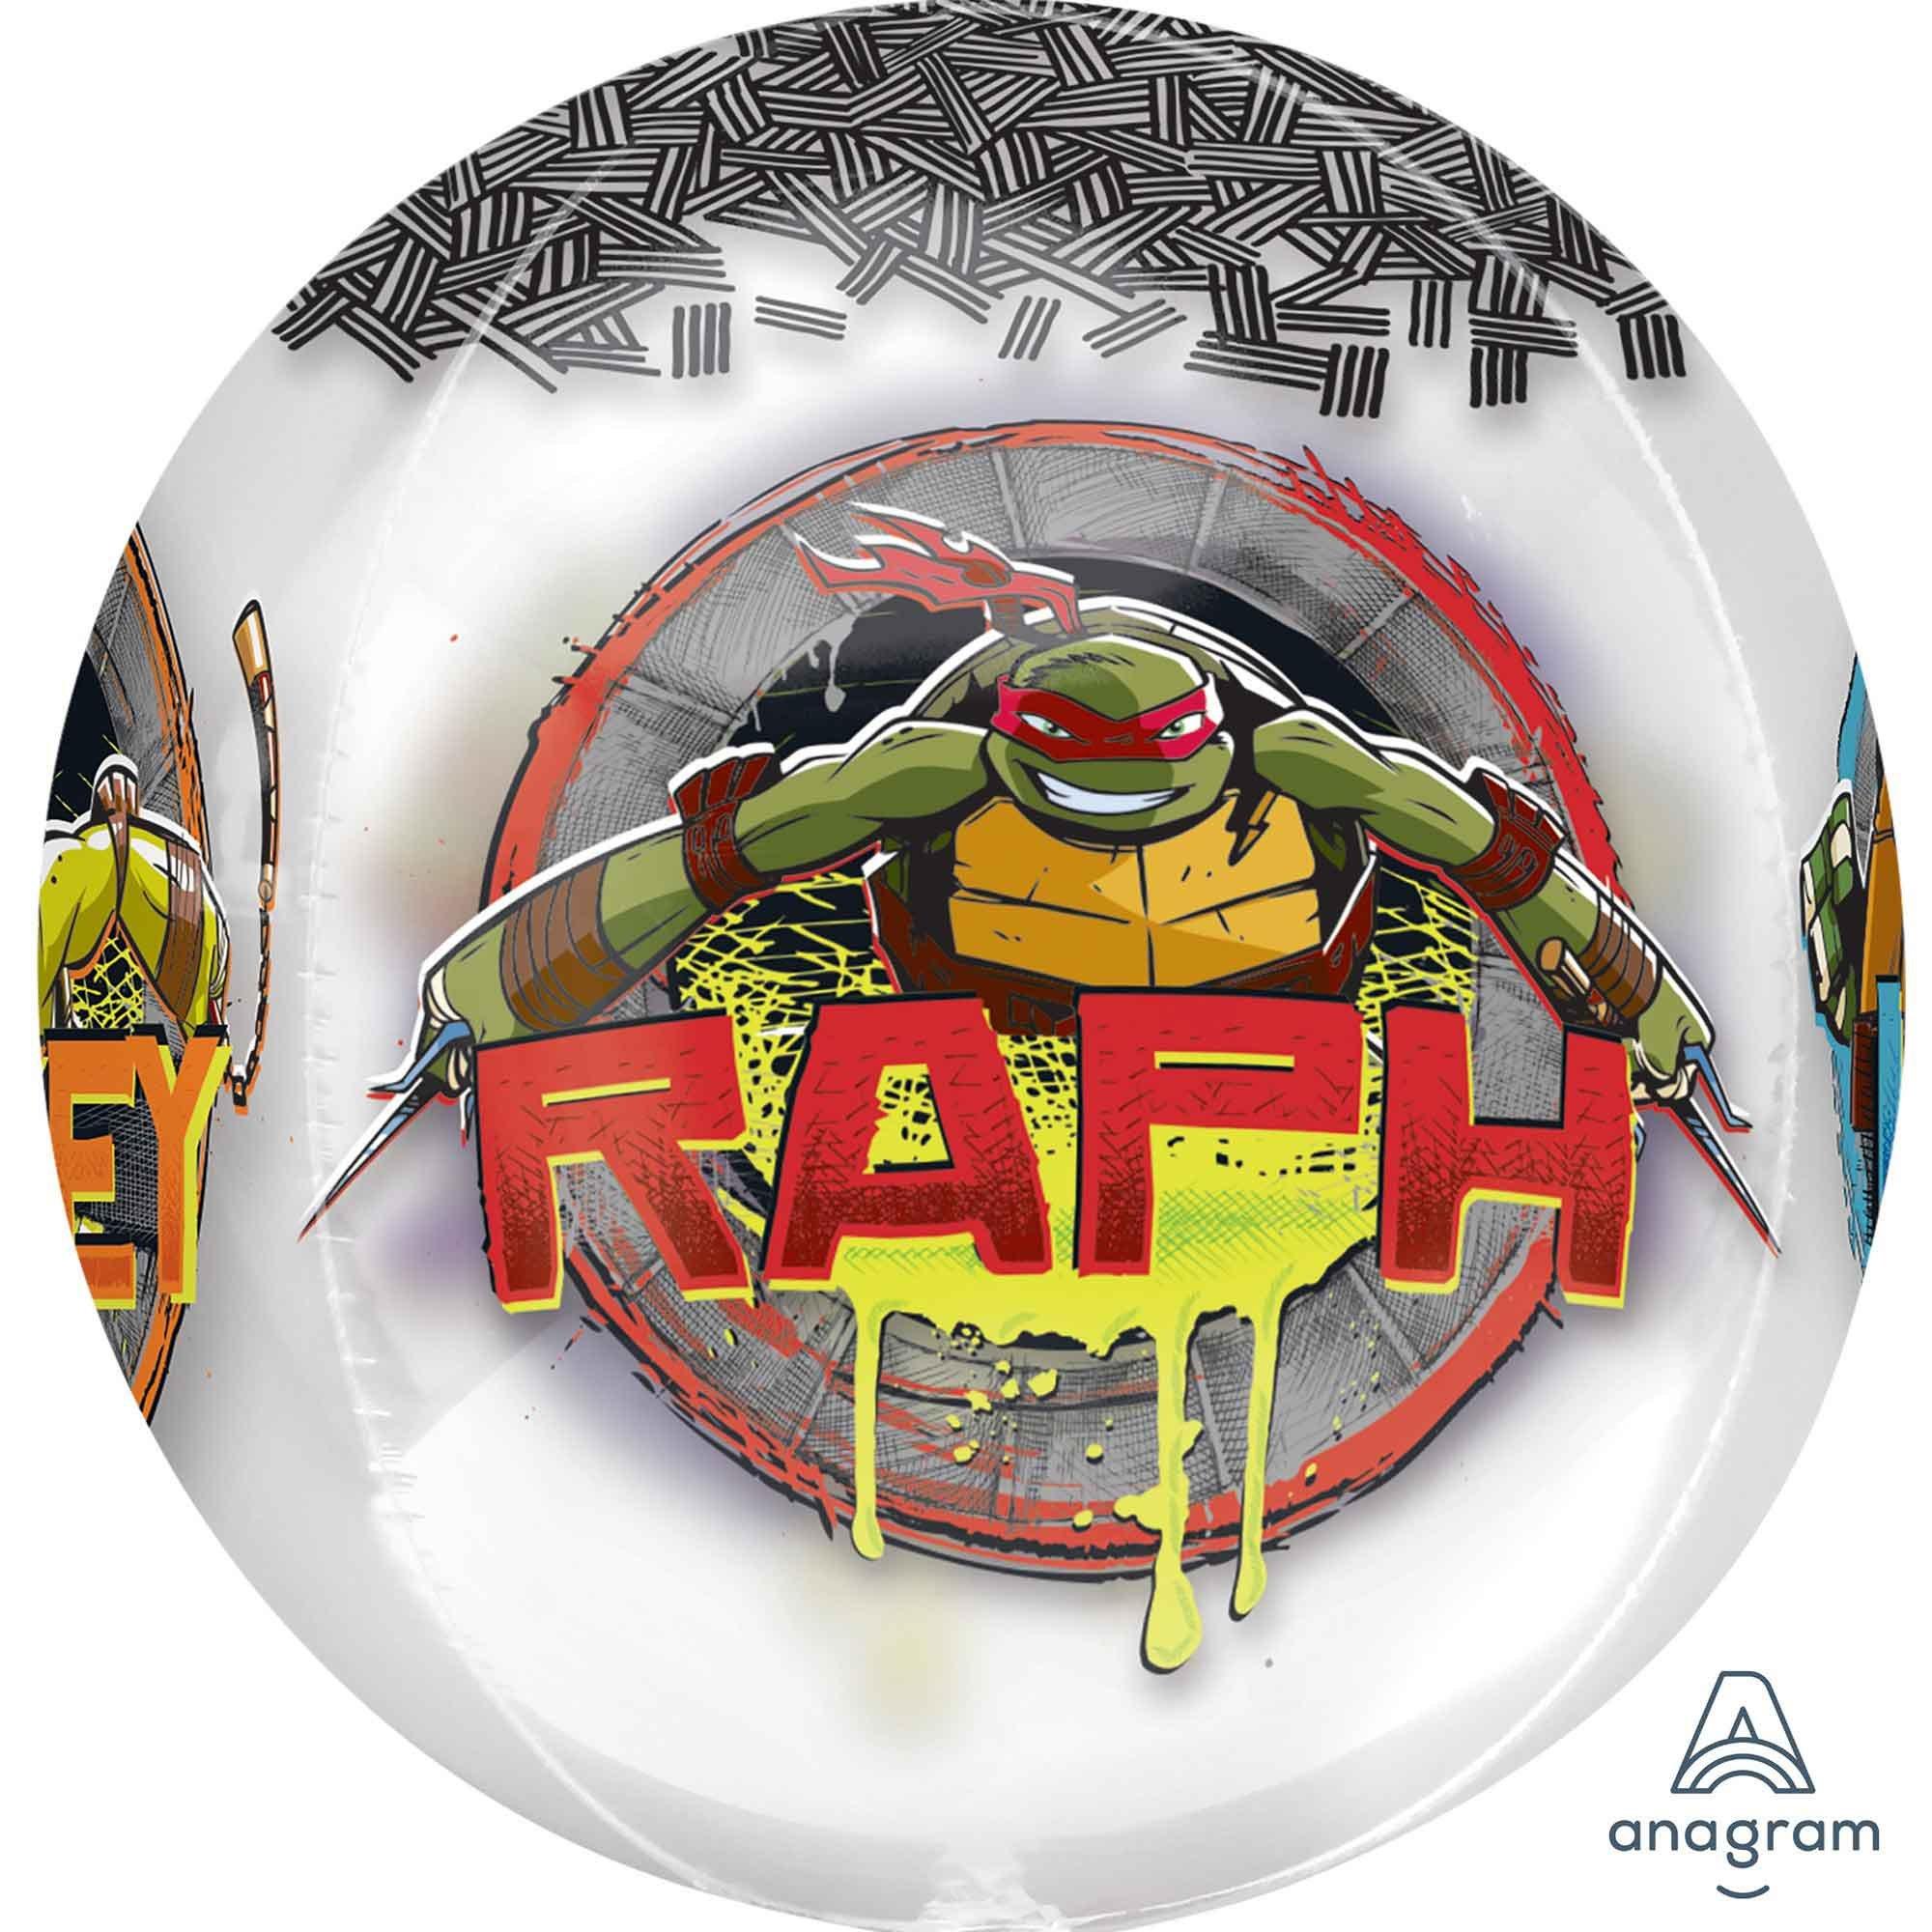 Orbz XL Teenage Mutant Ninja Turtles Clear G40